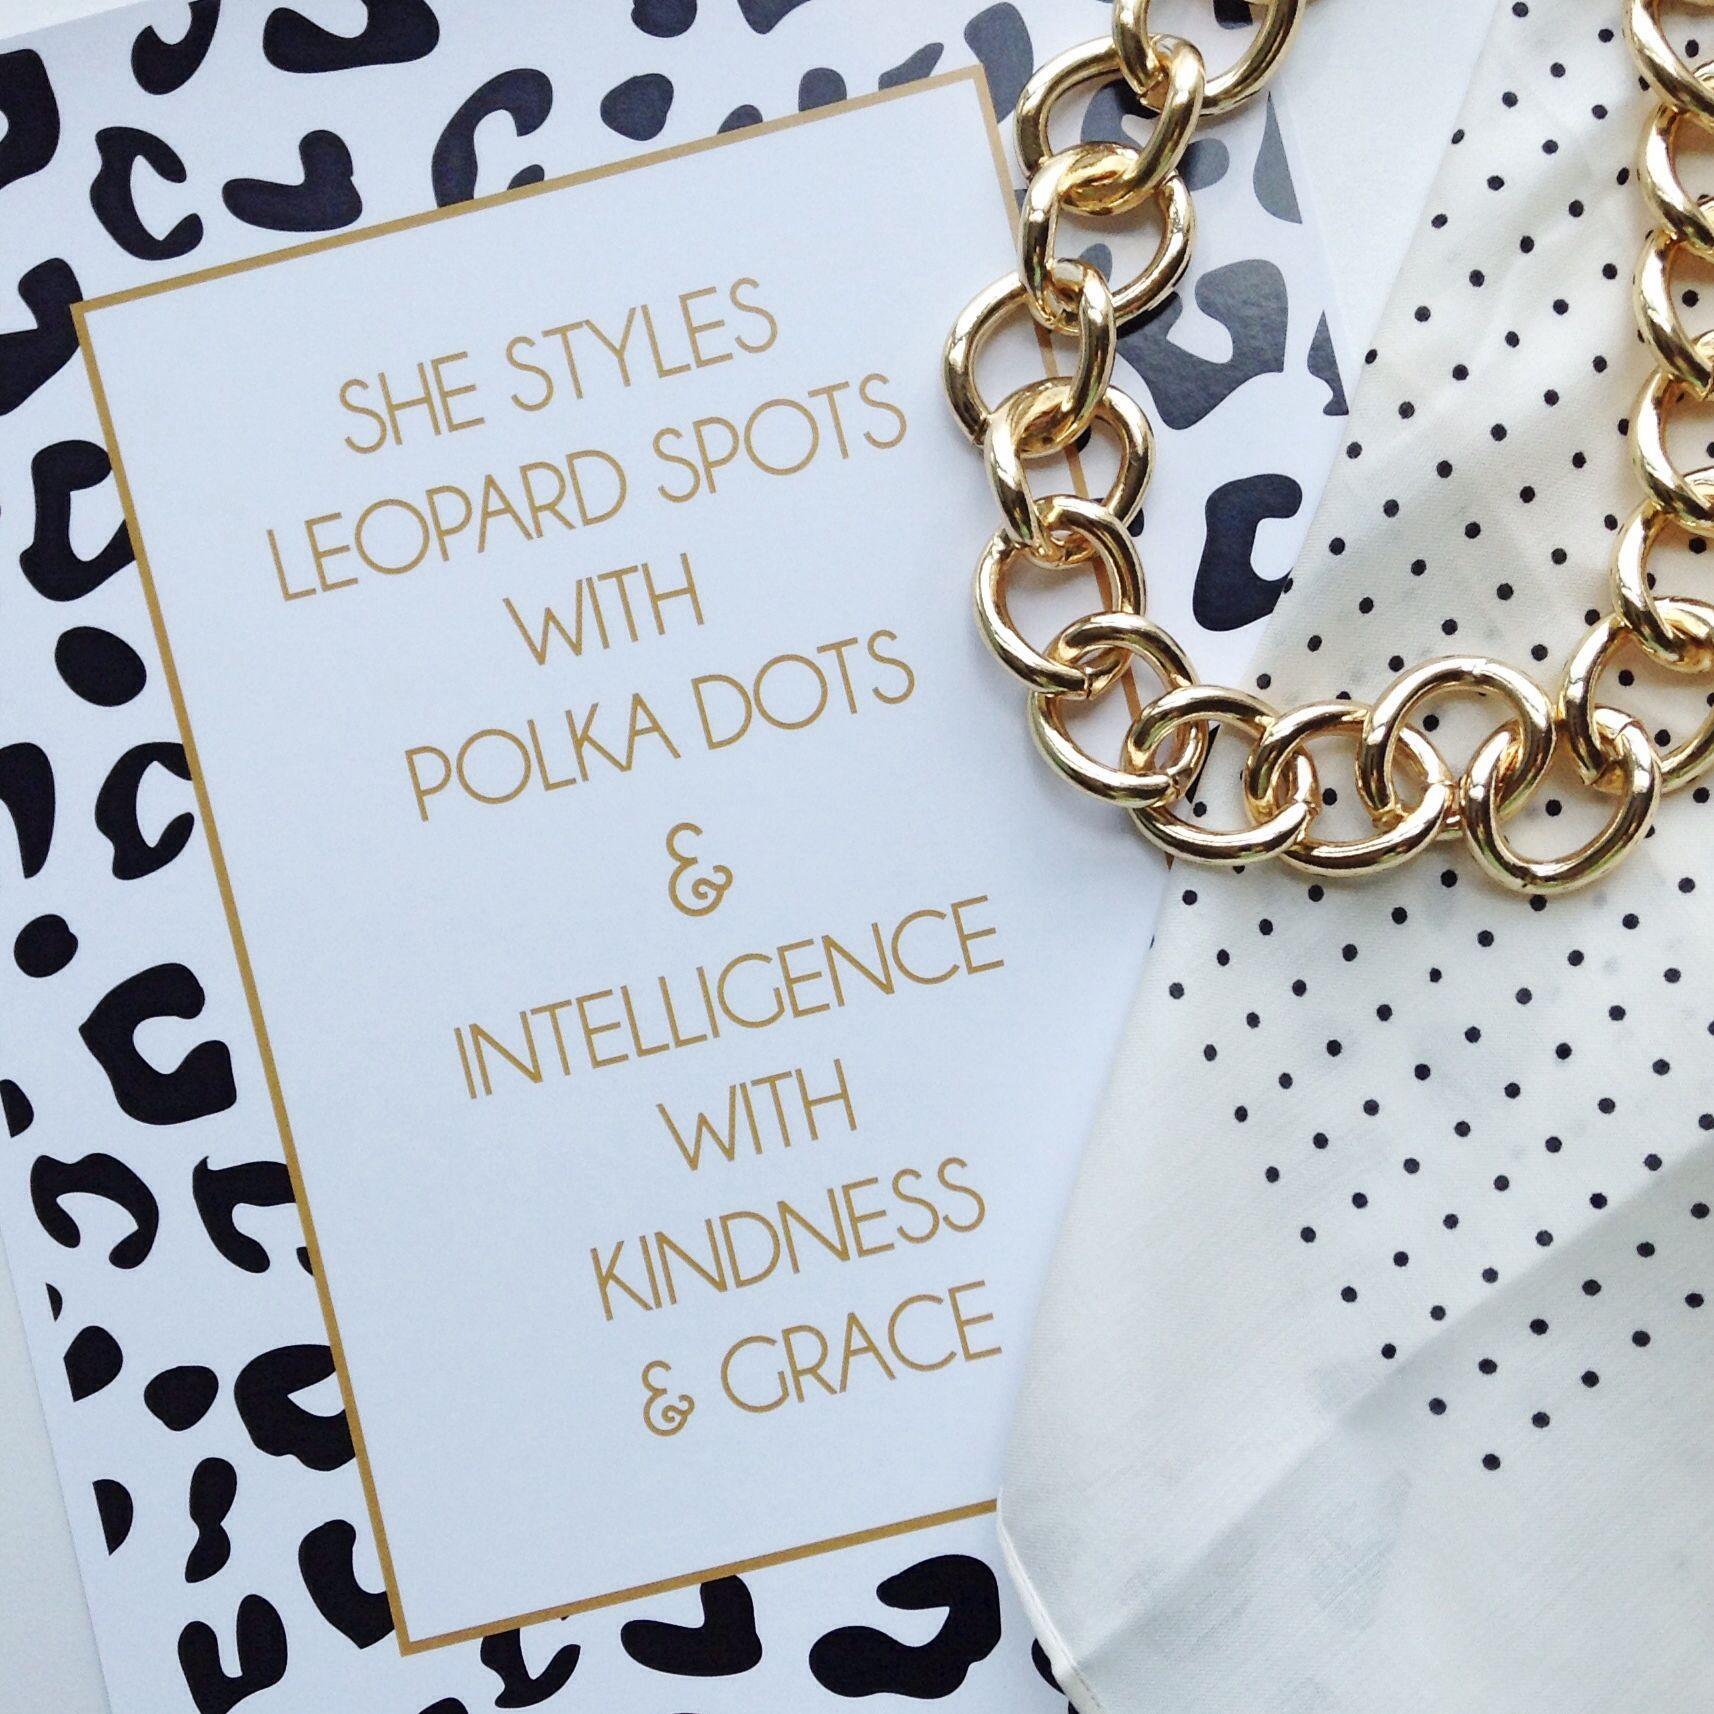 Amanda Catherine Designs 'Leopard Spots with Polka Dots' print